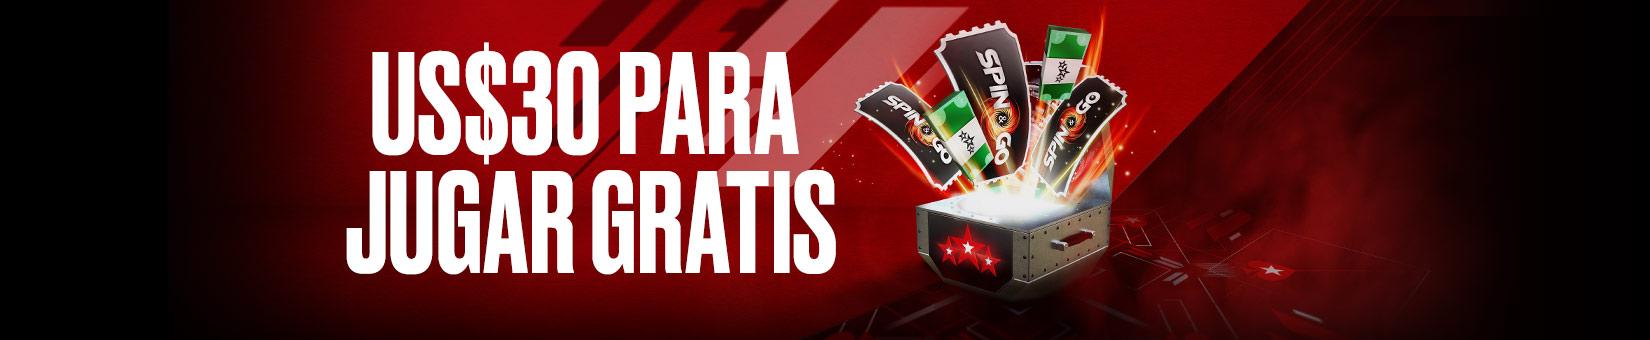 Pokerstar deportes casino online confiable Guyana-897602